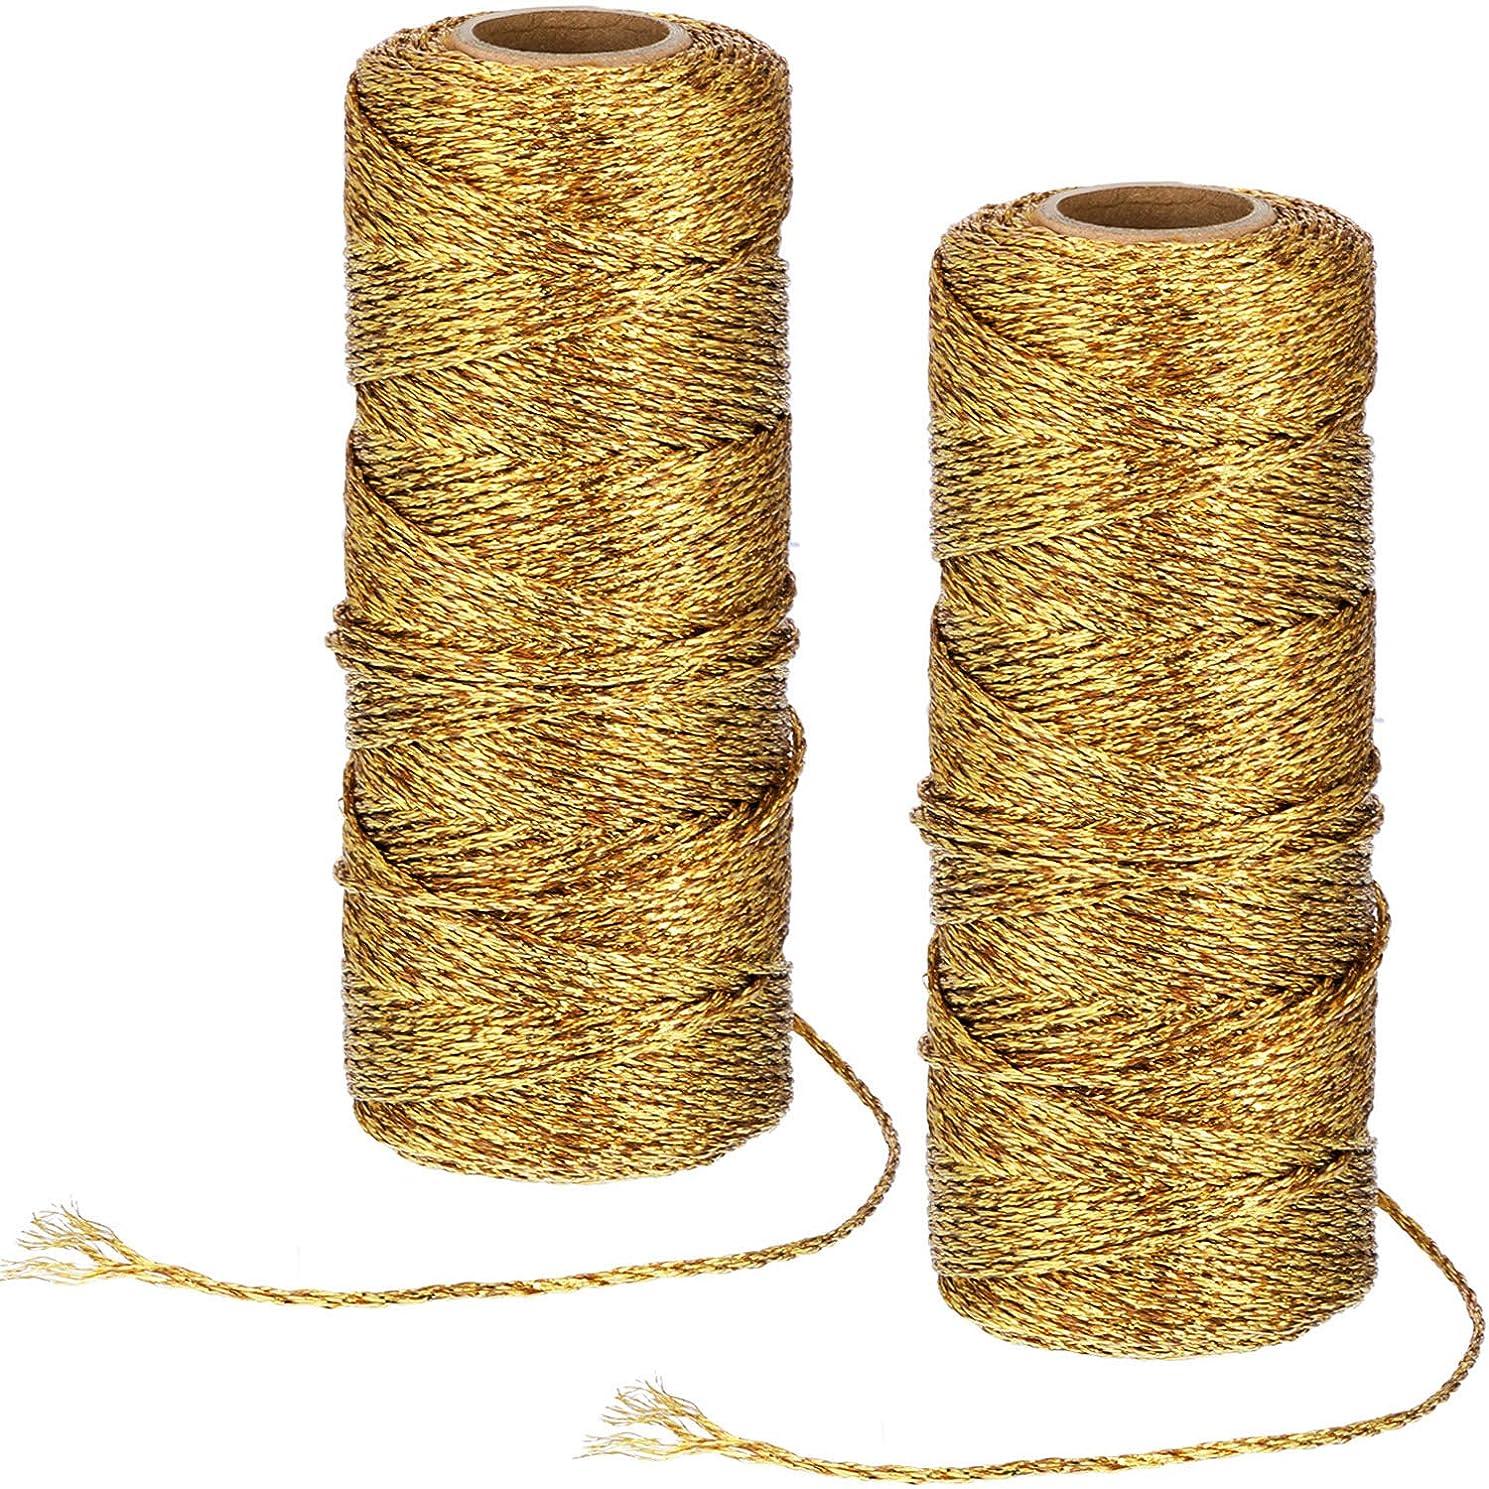 Pangda 220 Yard Metallic Baker Twine Craft Gold Twine Present Wrapping Cord for Christmas DIY Crafting